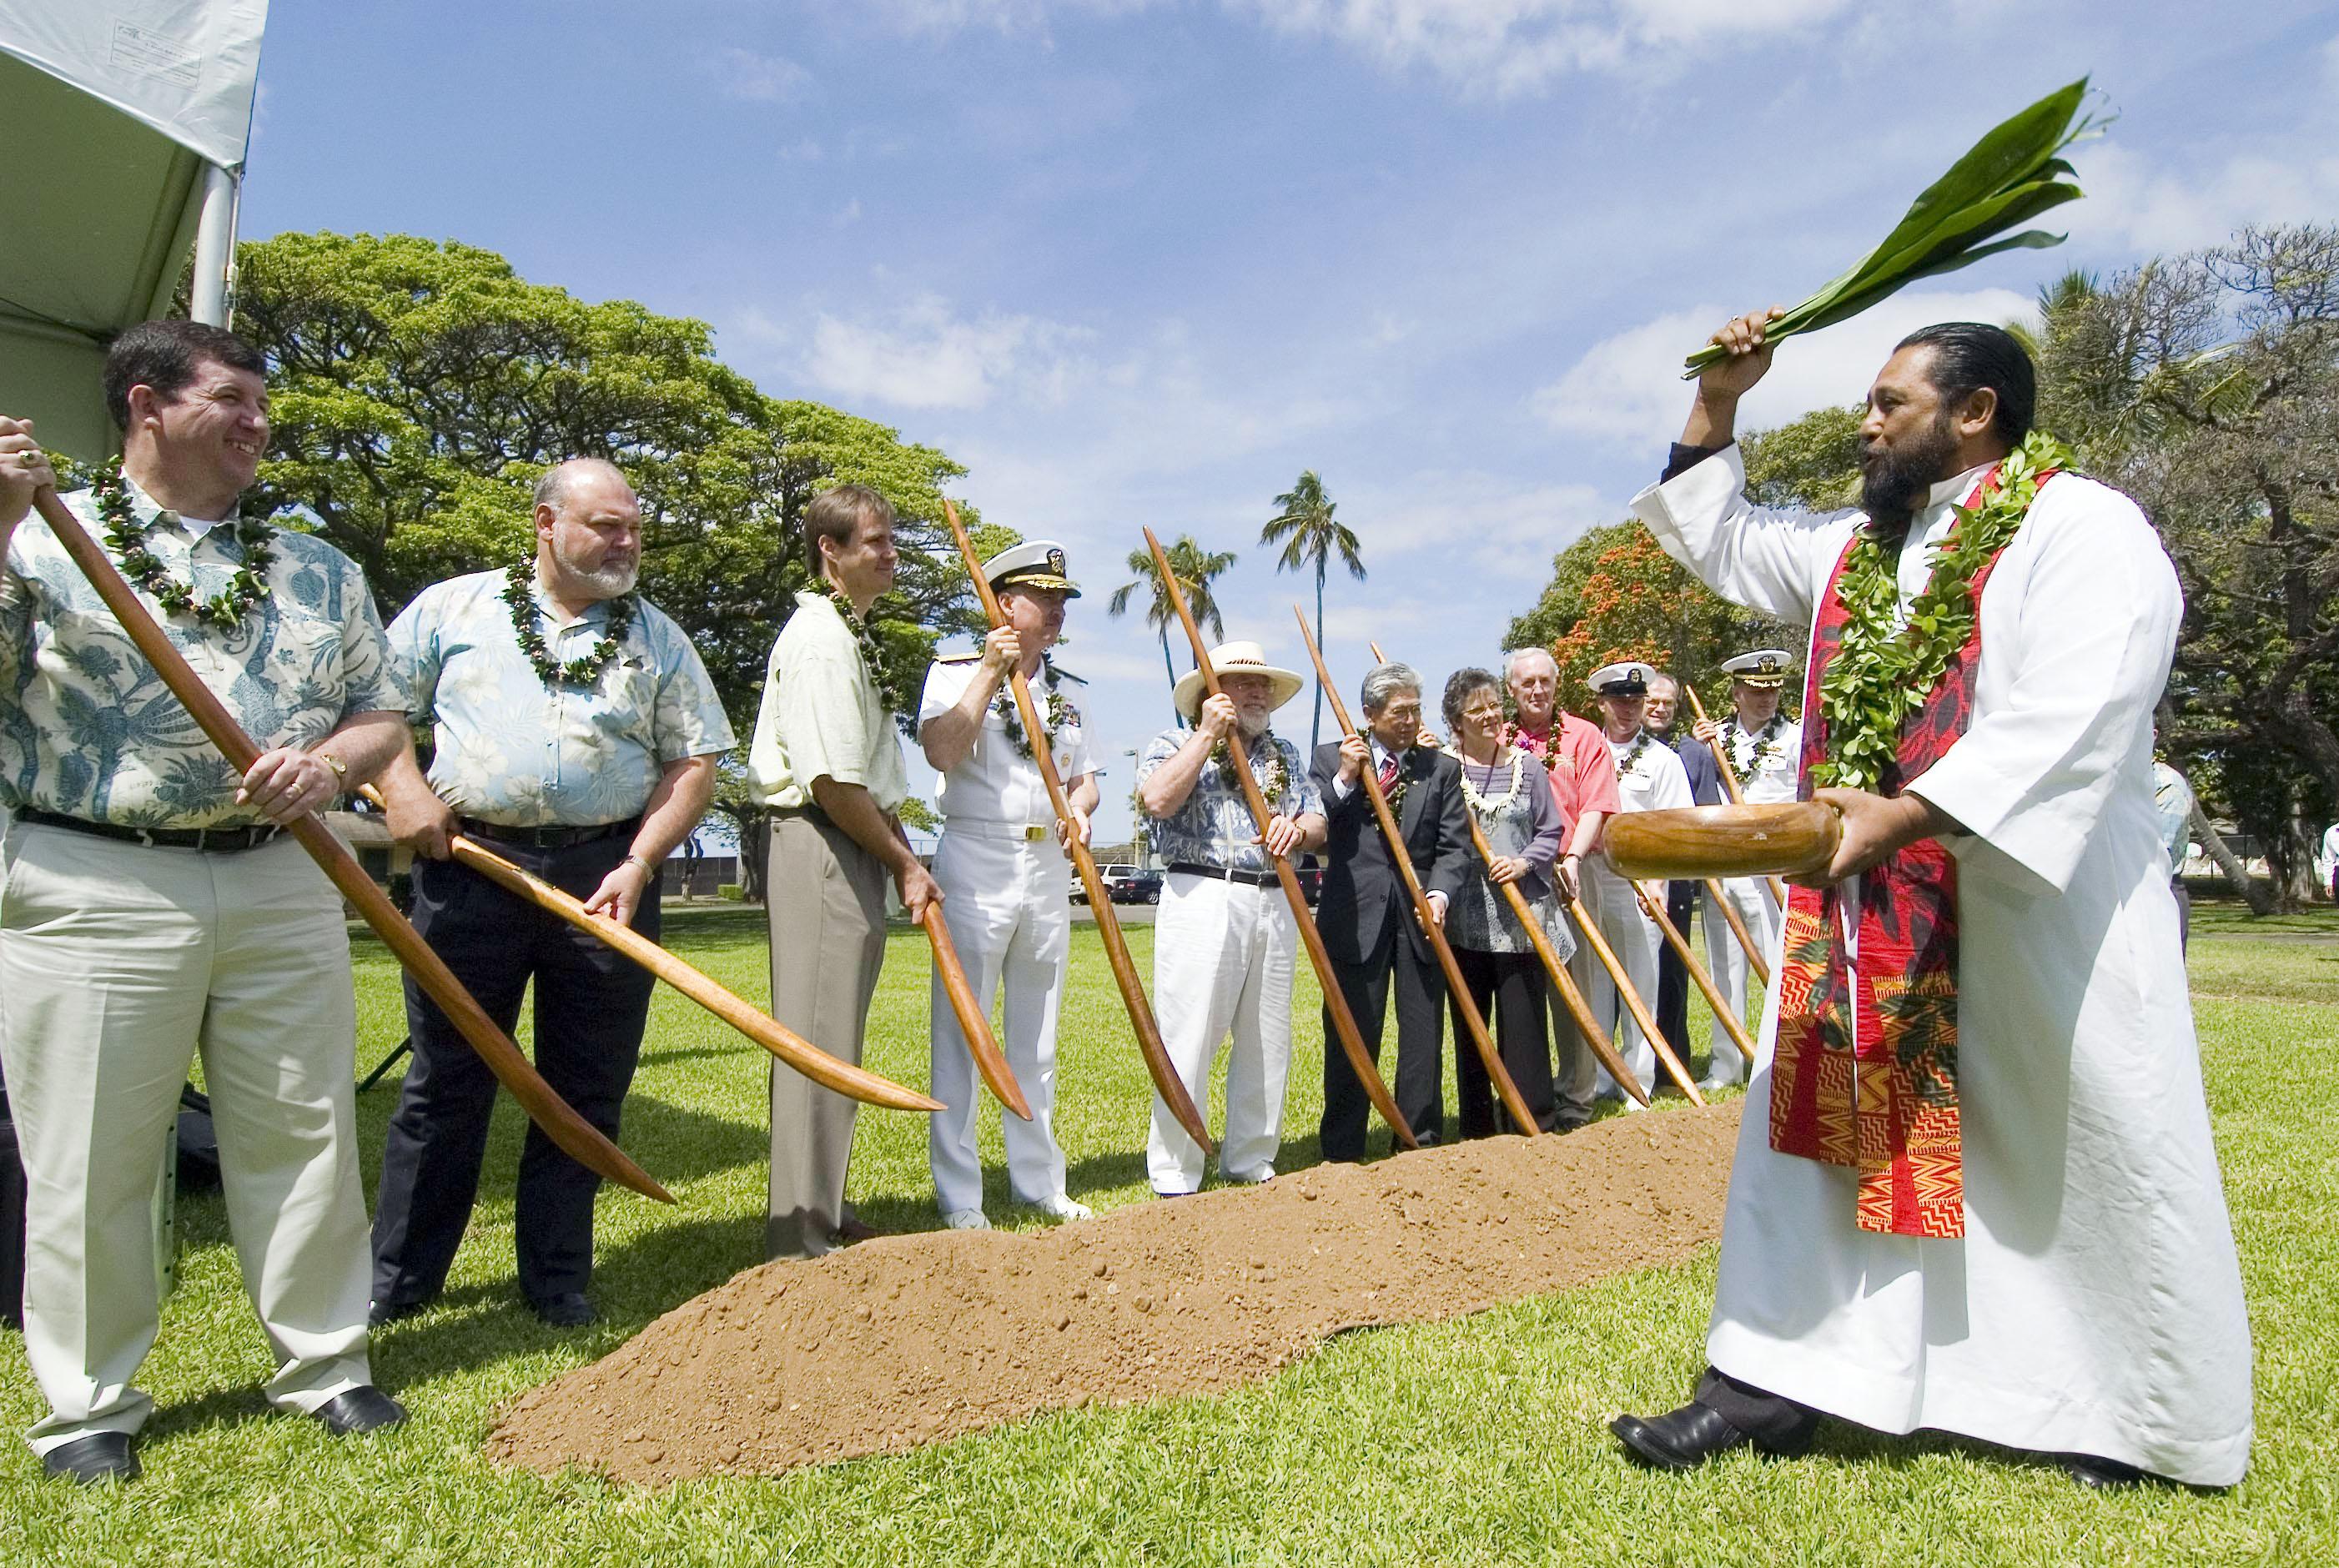 US Navy 070403 N 6674H 069 Kuhu Kaleo Patterson performs a traditional Hawaiian blessing as Commander%2C Navy Region Hawaii %28CNRH%29 Rear Adm. T. G. Alexander use Hawaiian o o sticks during a military housing groundbreaking ceremon - Hawaii Wedding